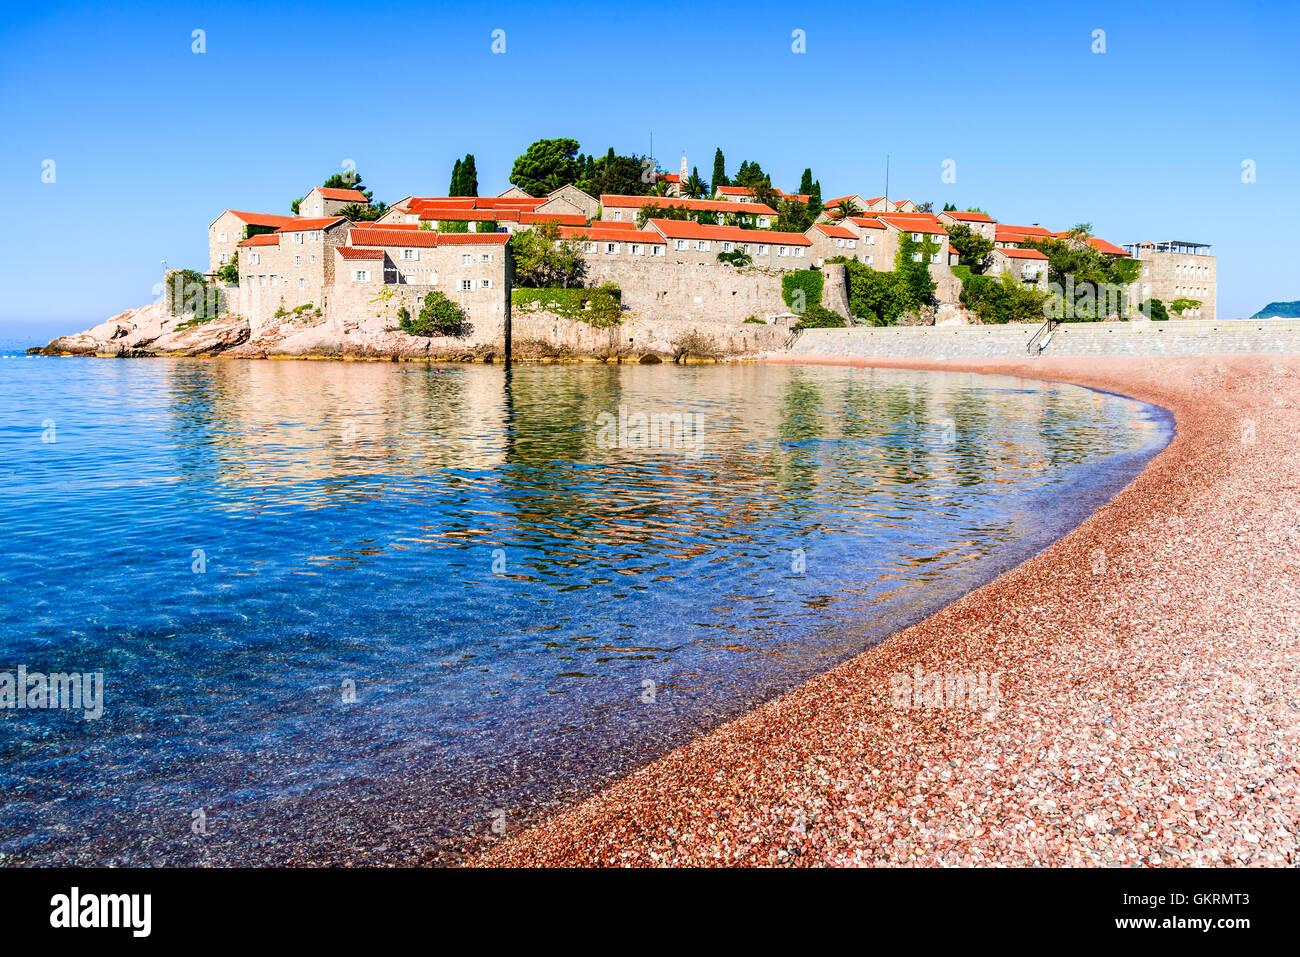 Sveti Stefan, Montenegro. View with fantastic small island and resort on the Adriatic Sea coast, Budva city region. - Stock Image